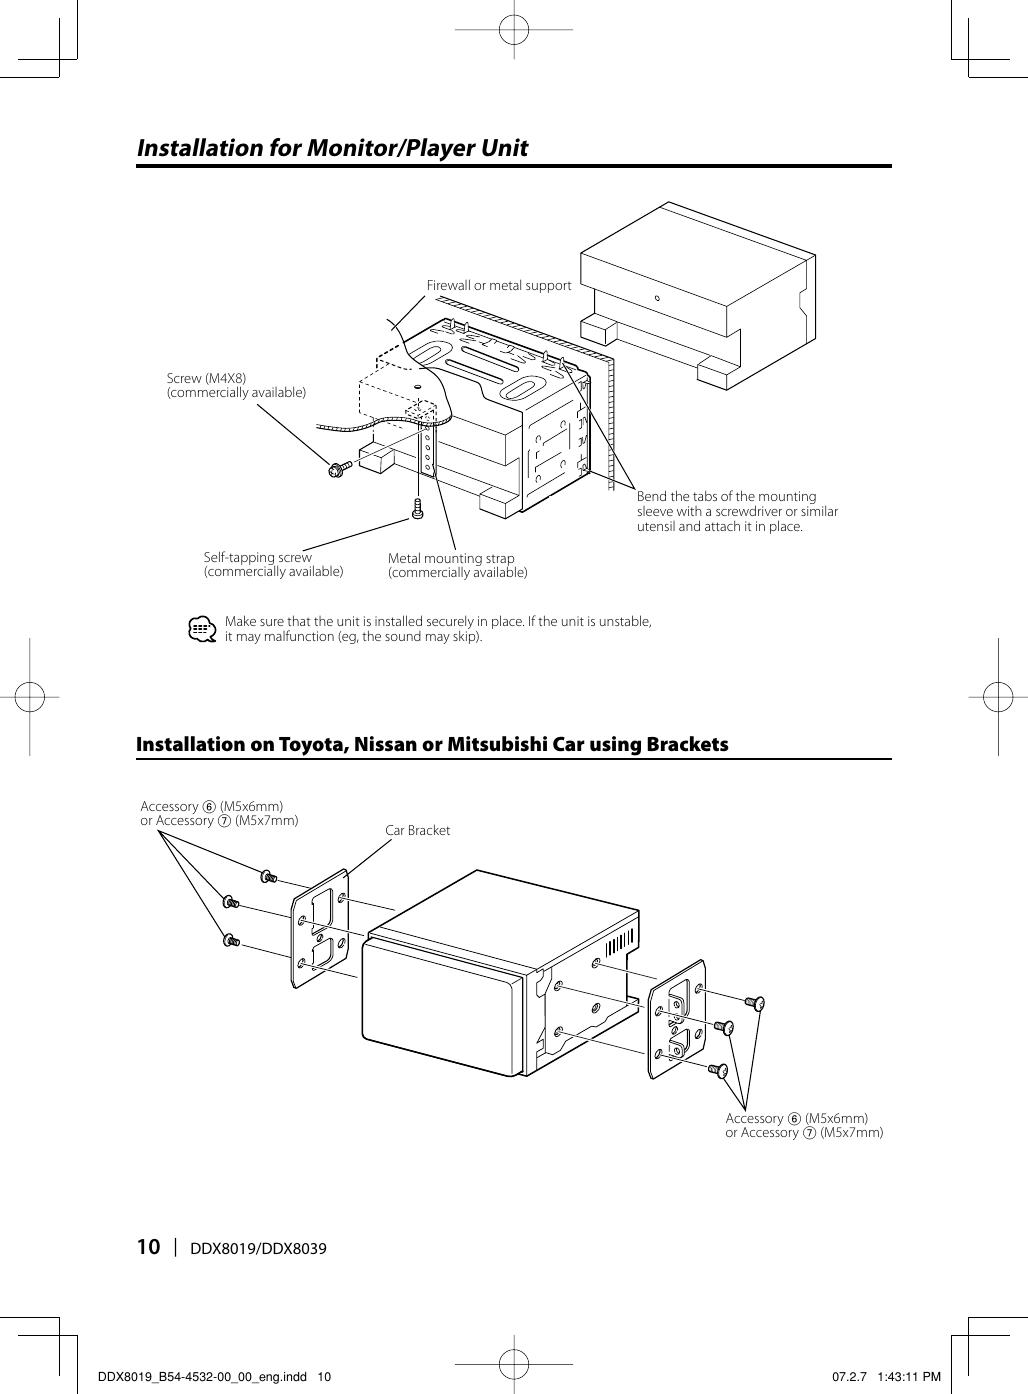 Kenwood Excelon Ddx8019 Users Manual DDX8019_B54 4532 00